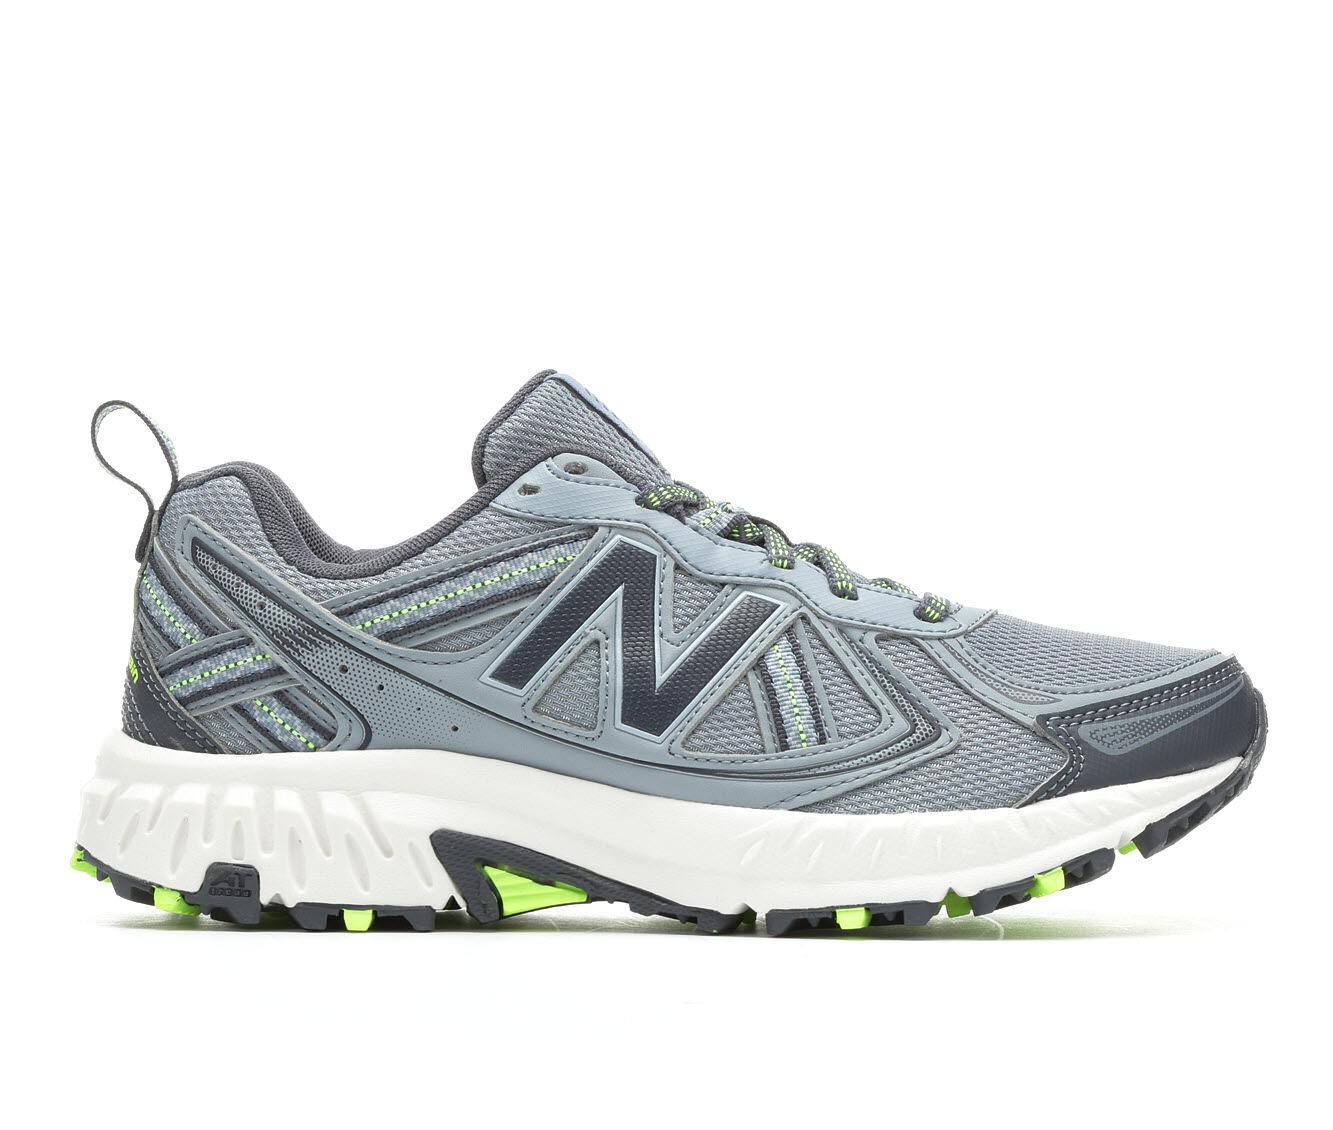 Women's New Balance WT410V2 Running Shoes low shipping sale online toK9i0pfjk